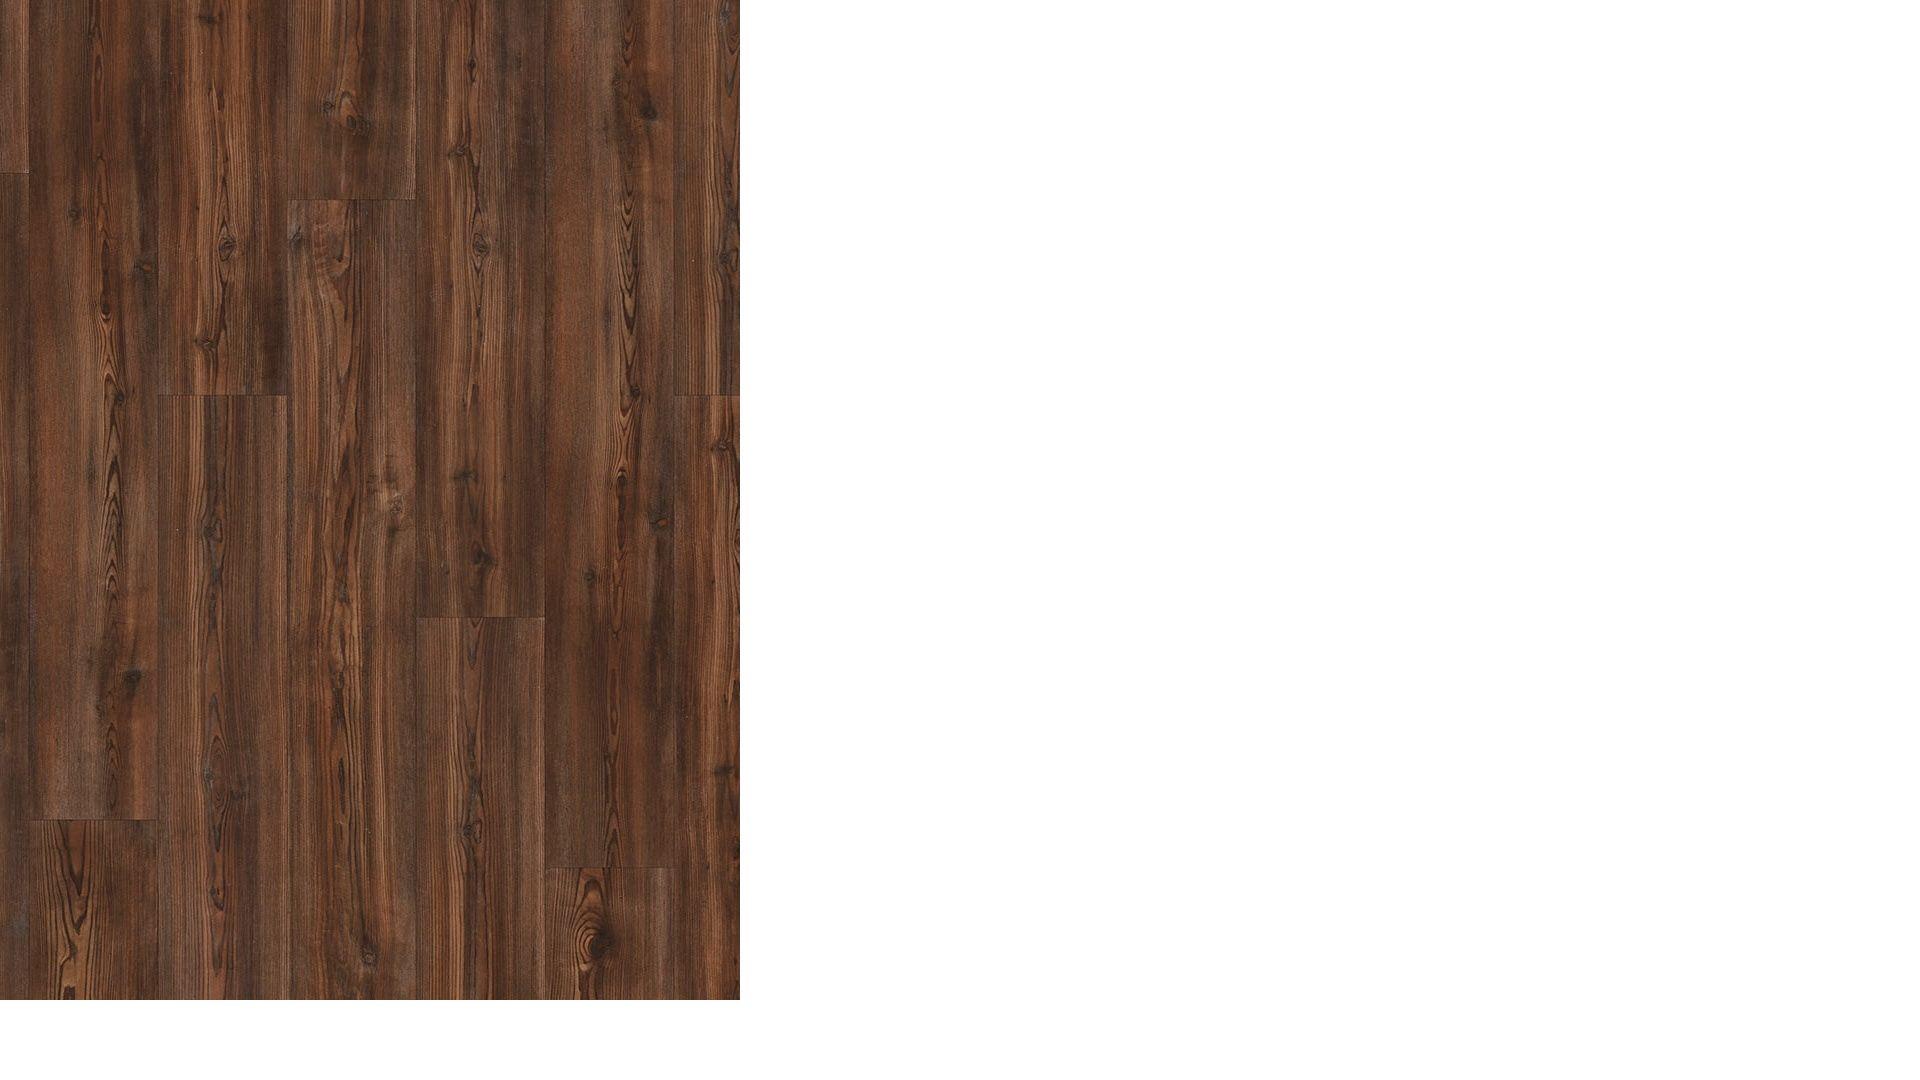 ALAMITOS PINE EVP Vinyl Flooring Product Shot